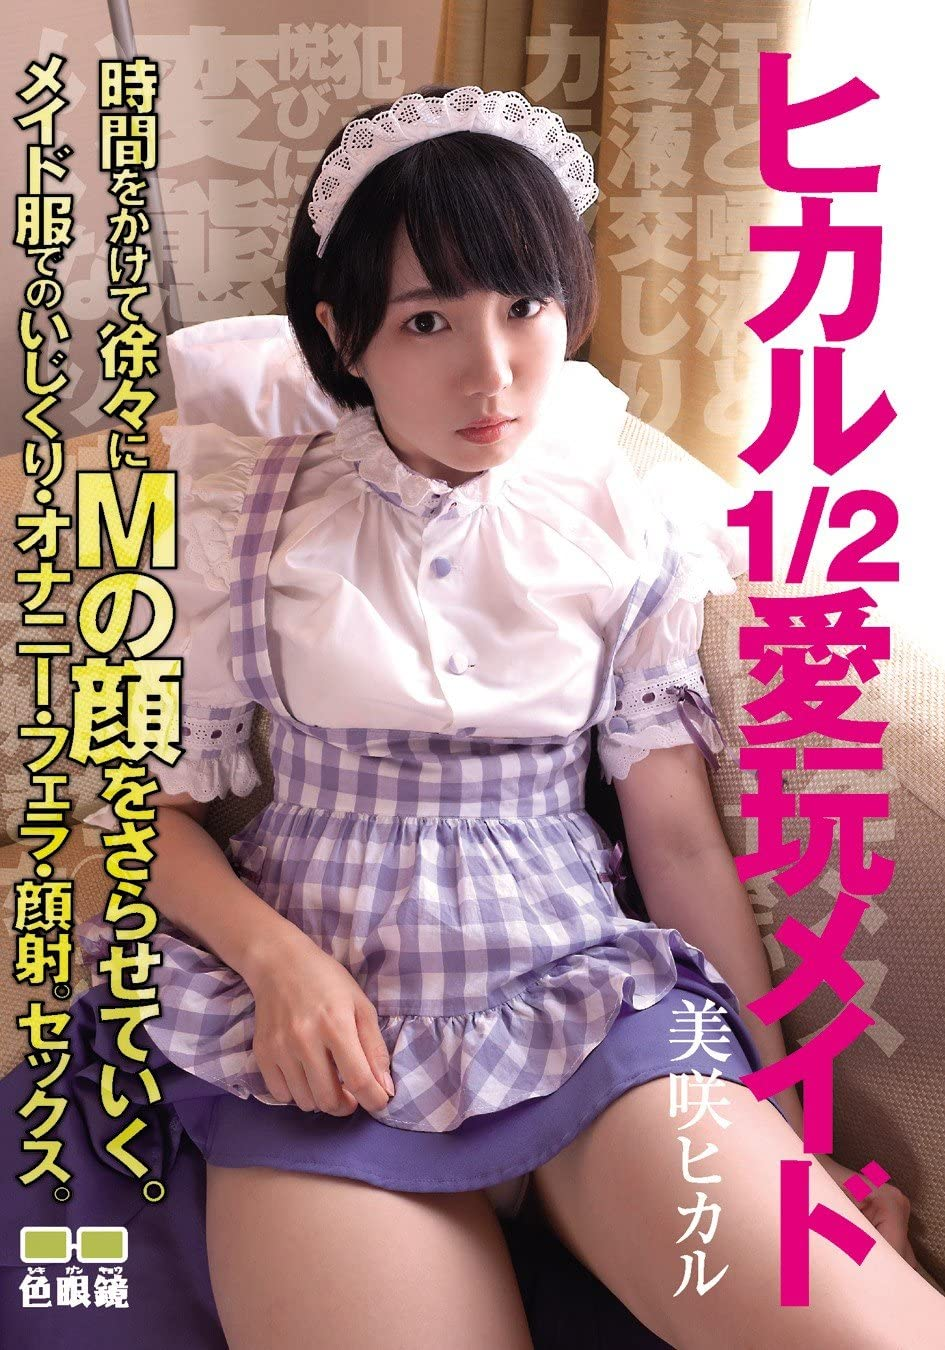 色眼鏡 顔射 sgl018 :: iromegane.jp